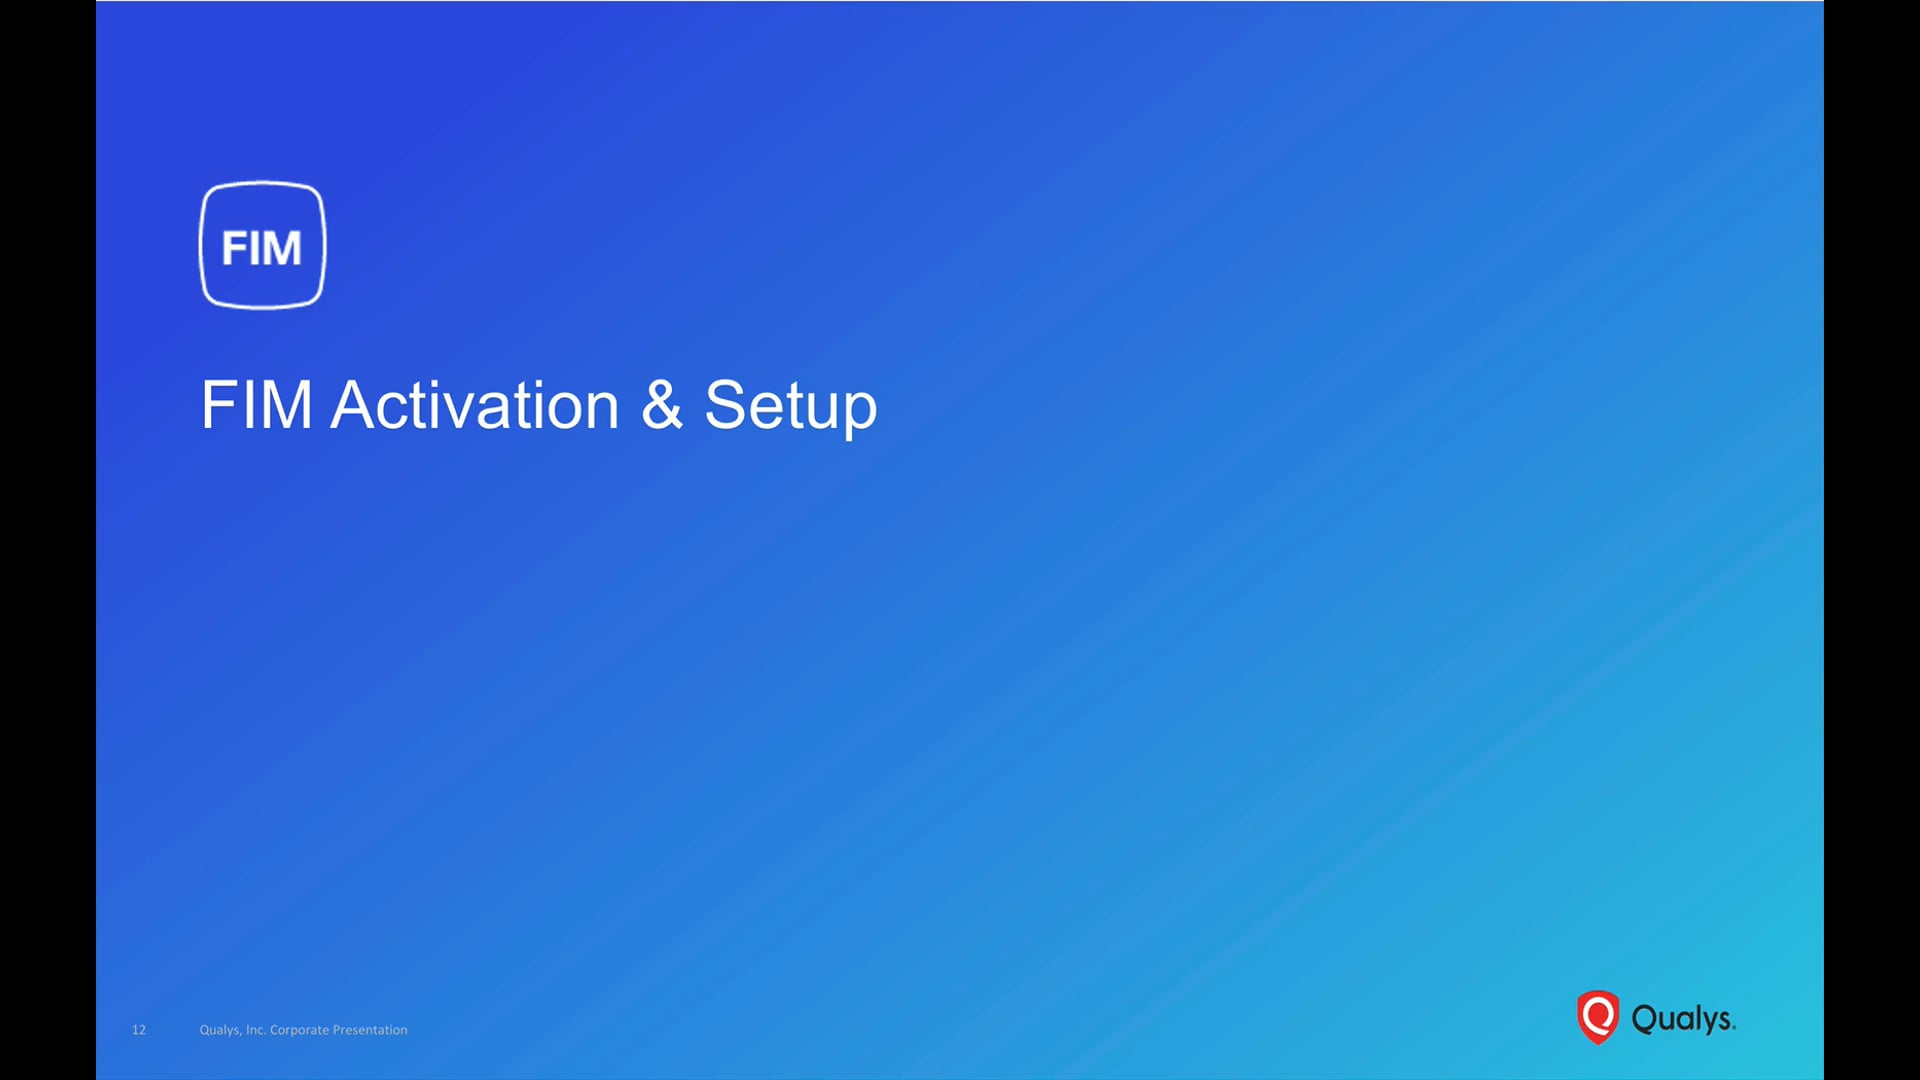 FIM Activation & Setup